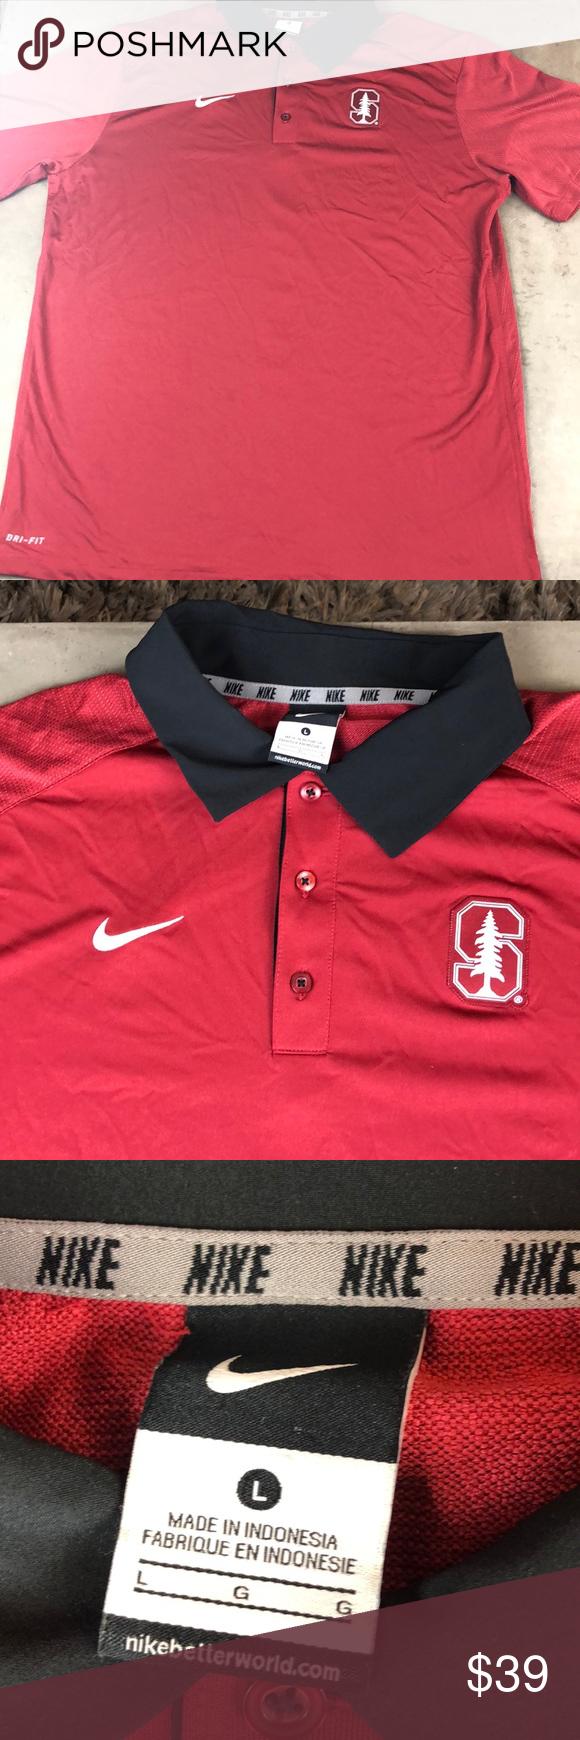 Nike Dri Fit Stanford University Golf Polo Shirt Nike Dri Fit Golf